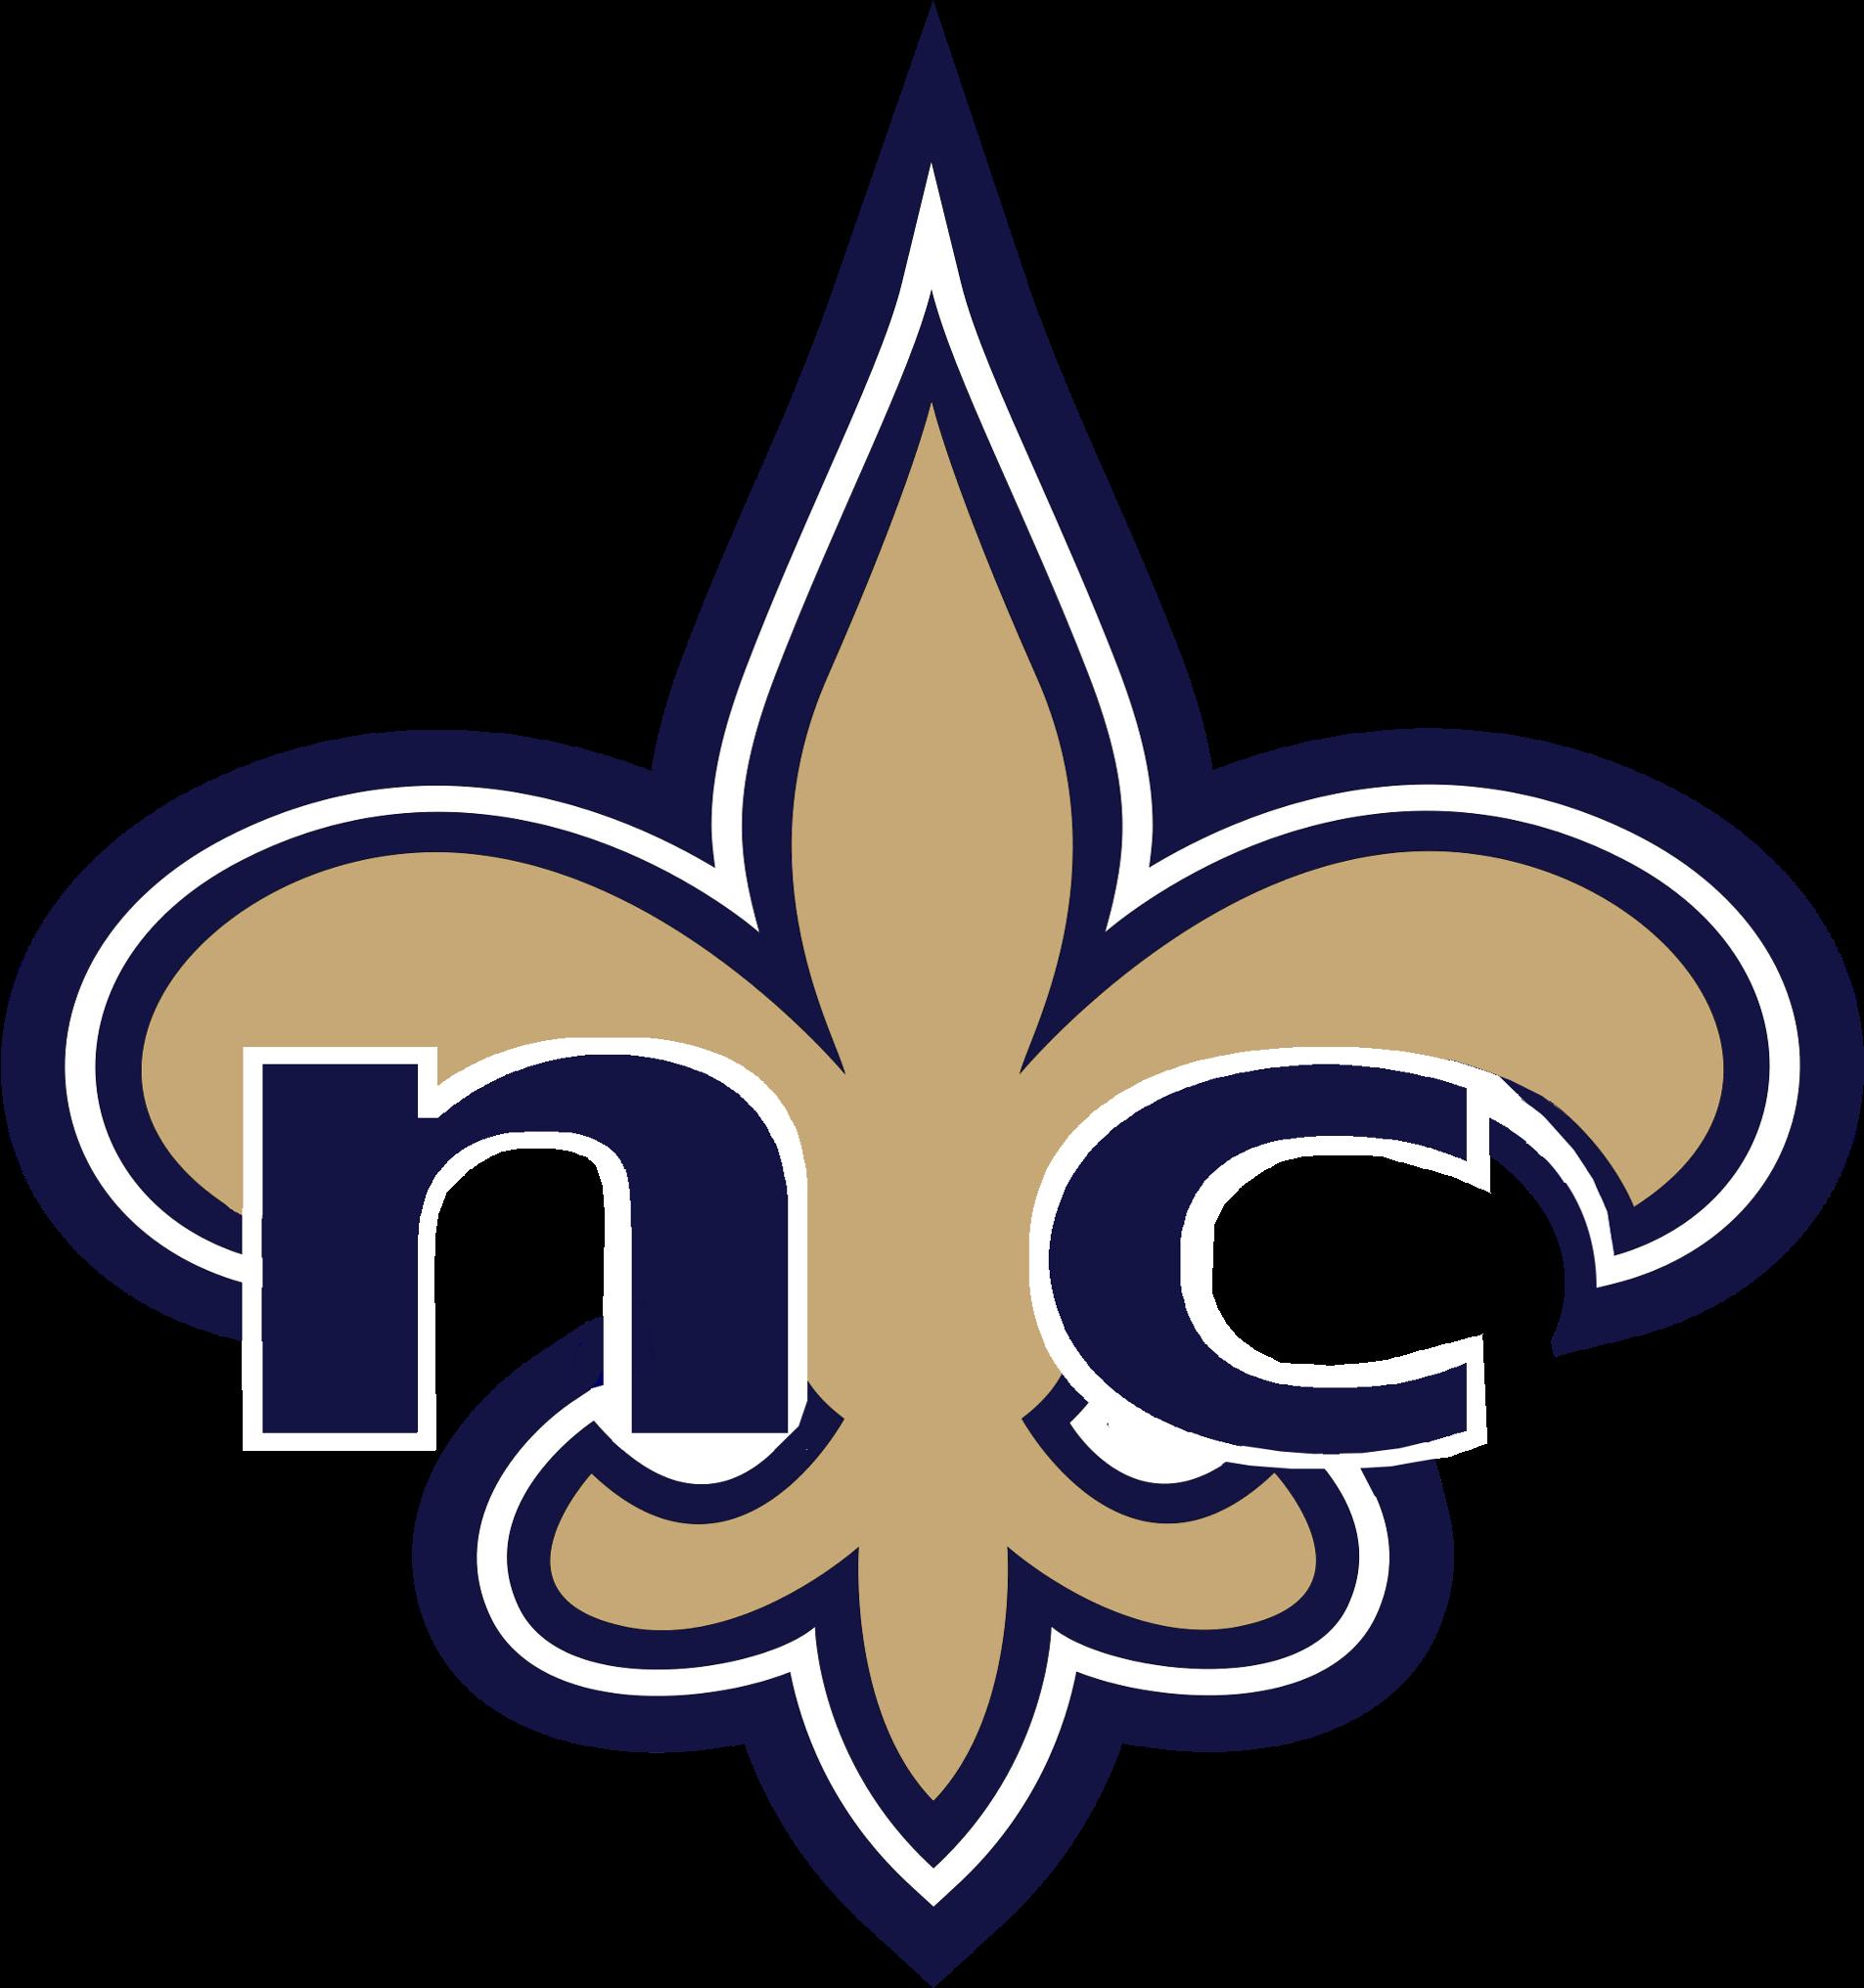 Saints Logo Png Clipart - Large Size Png Image - PikPng